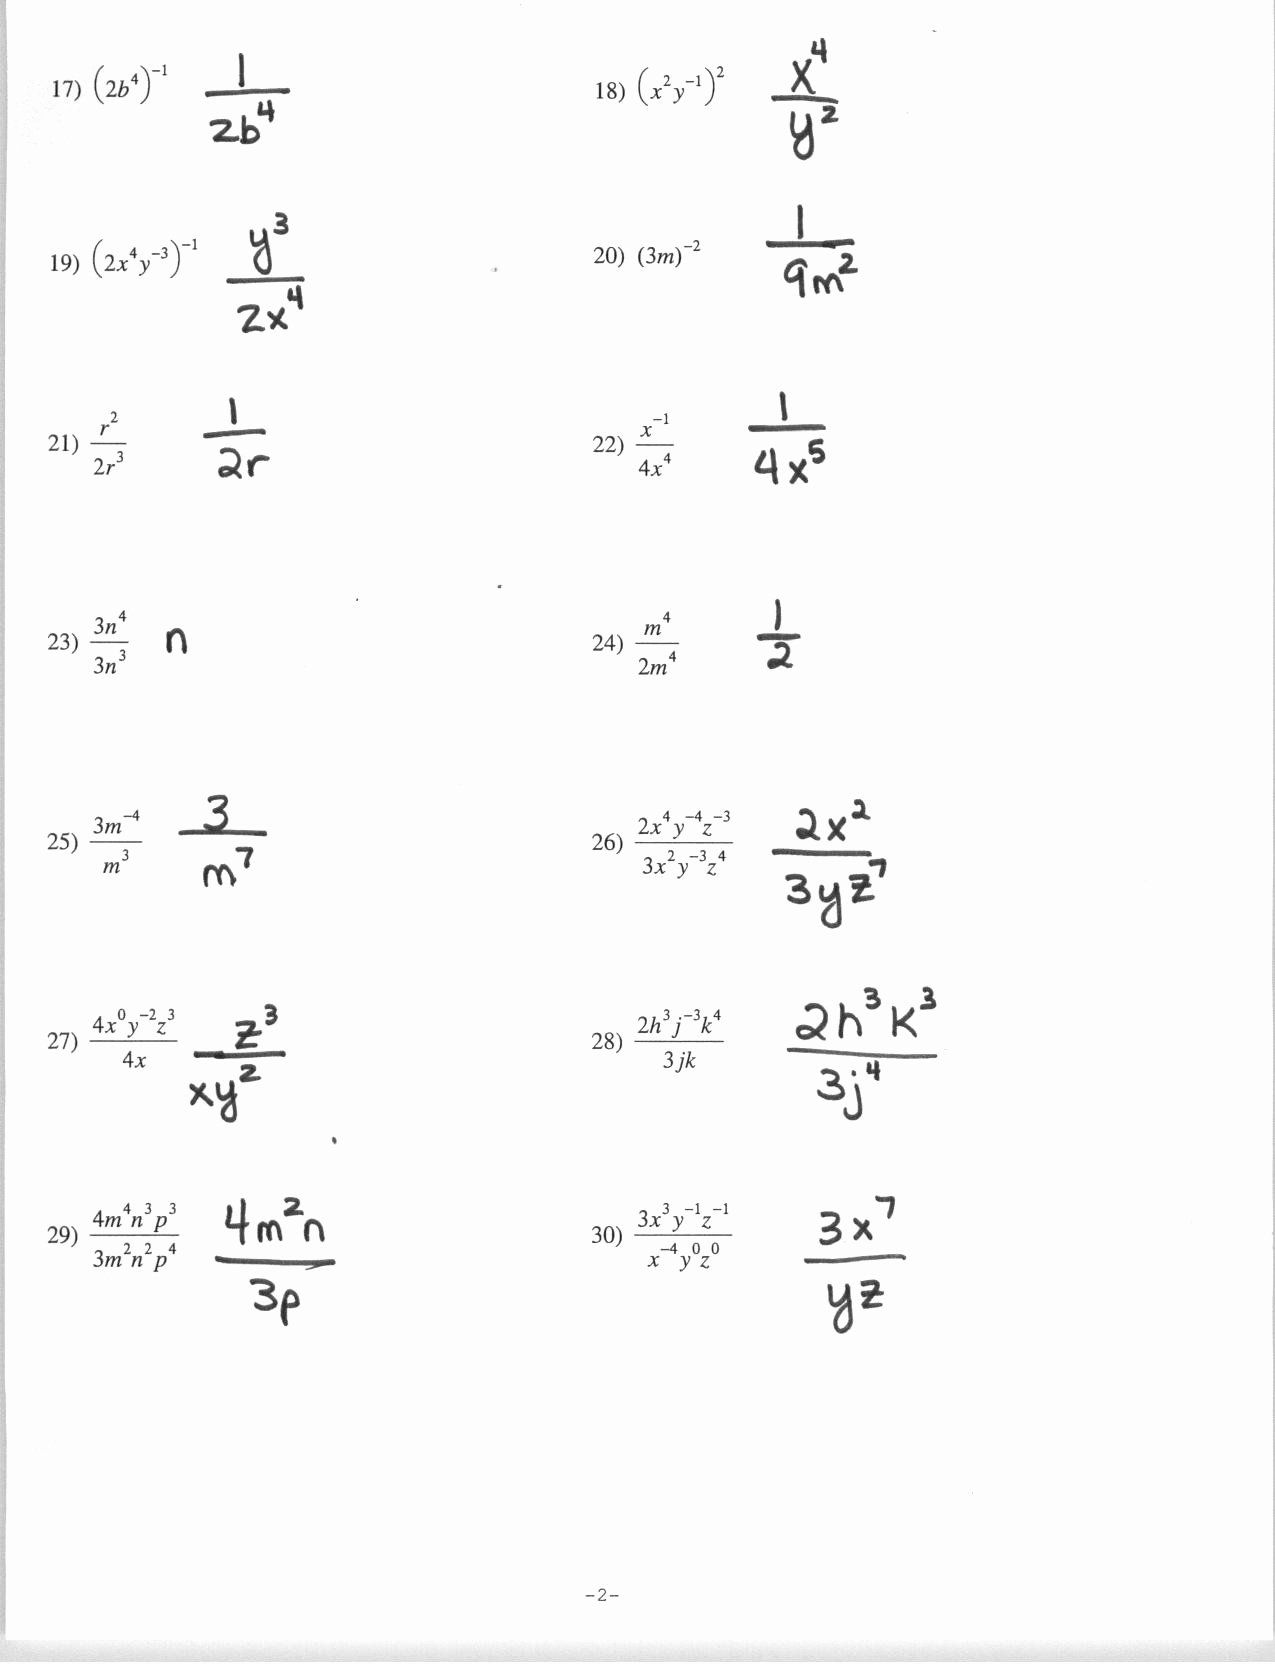 Negative Exponents Worksheet Pdf Awesome Exponents Worksheet Grade 7 Pdf Exponent Worksheets Rational Expressions Simplifying Radicals